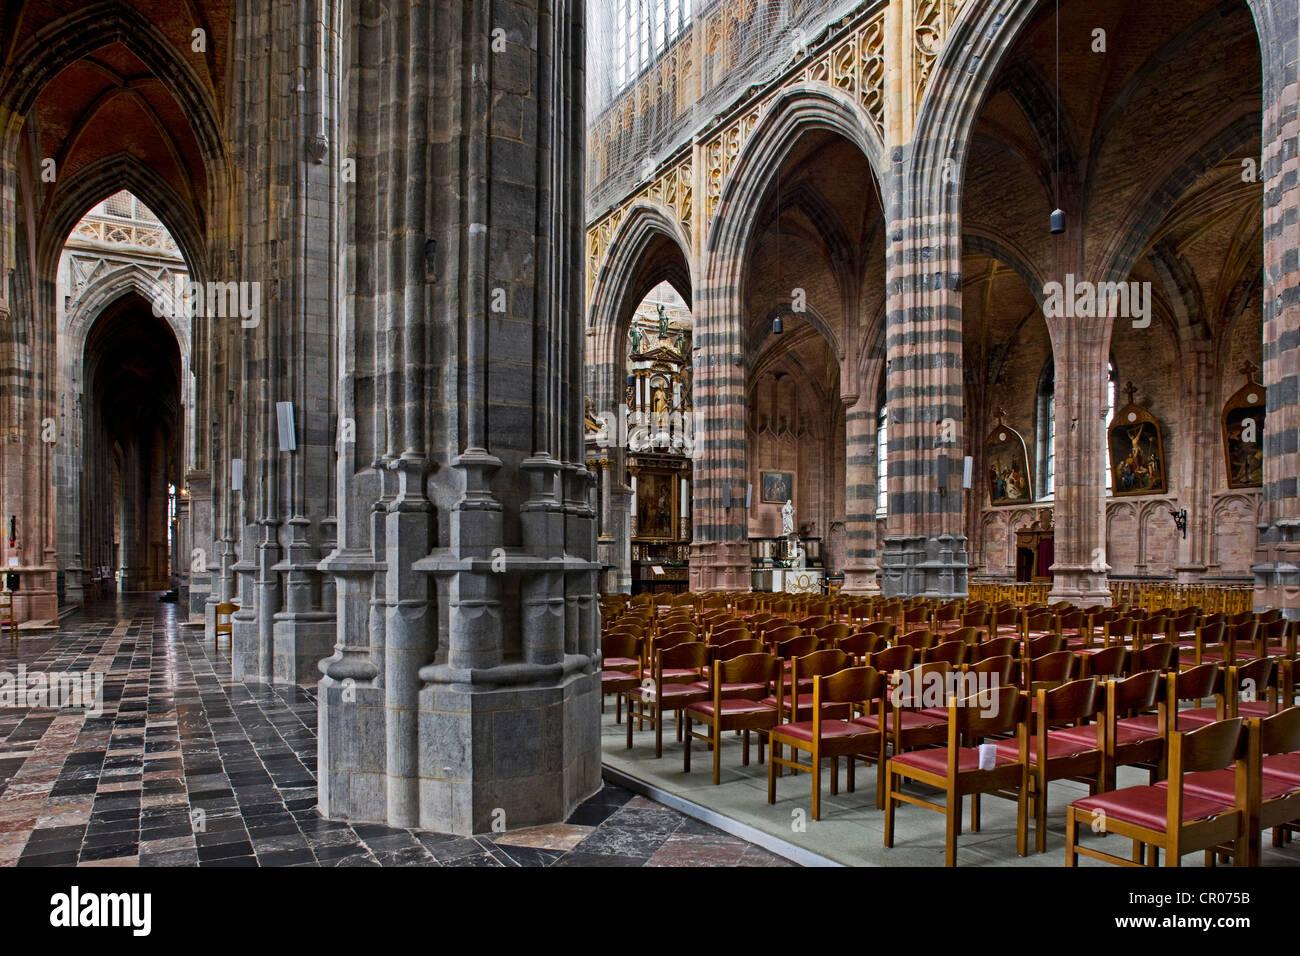 Interior of the basilica of Saint Hubert at Saint-Hubert, Belgian Ardennes, Belgium - Stock Image